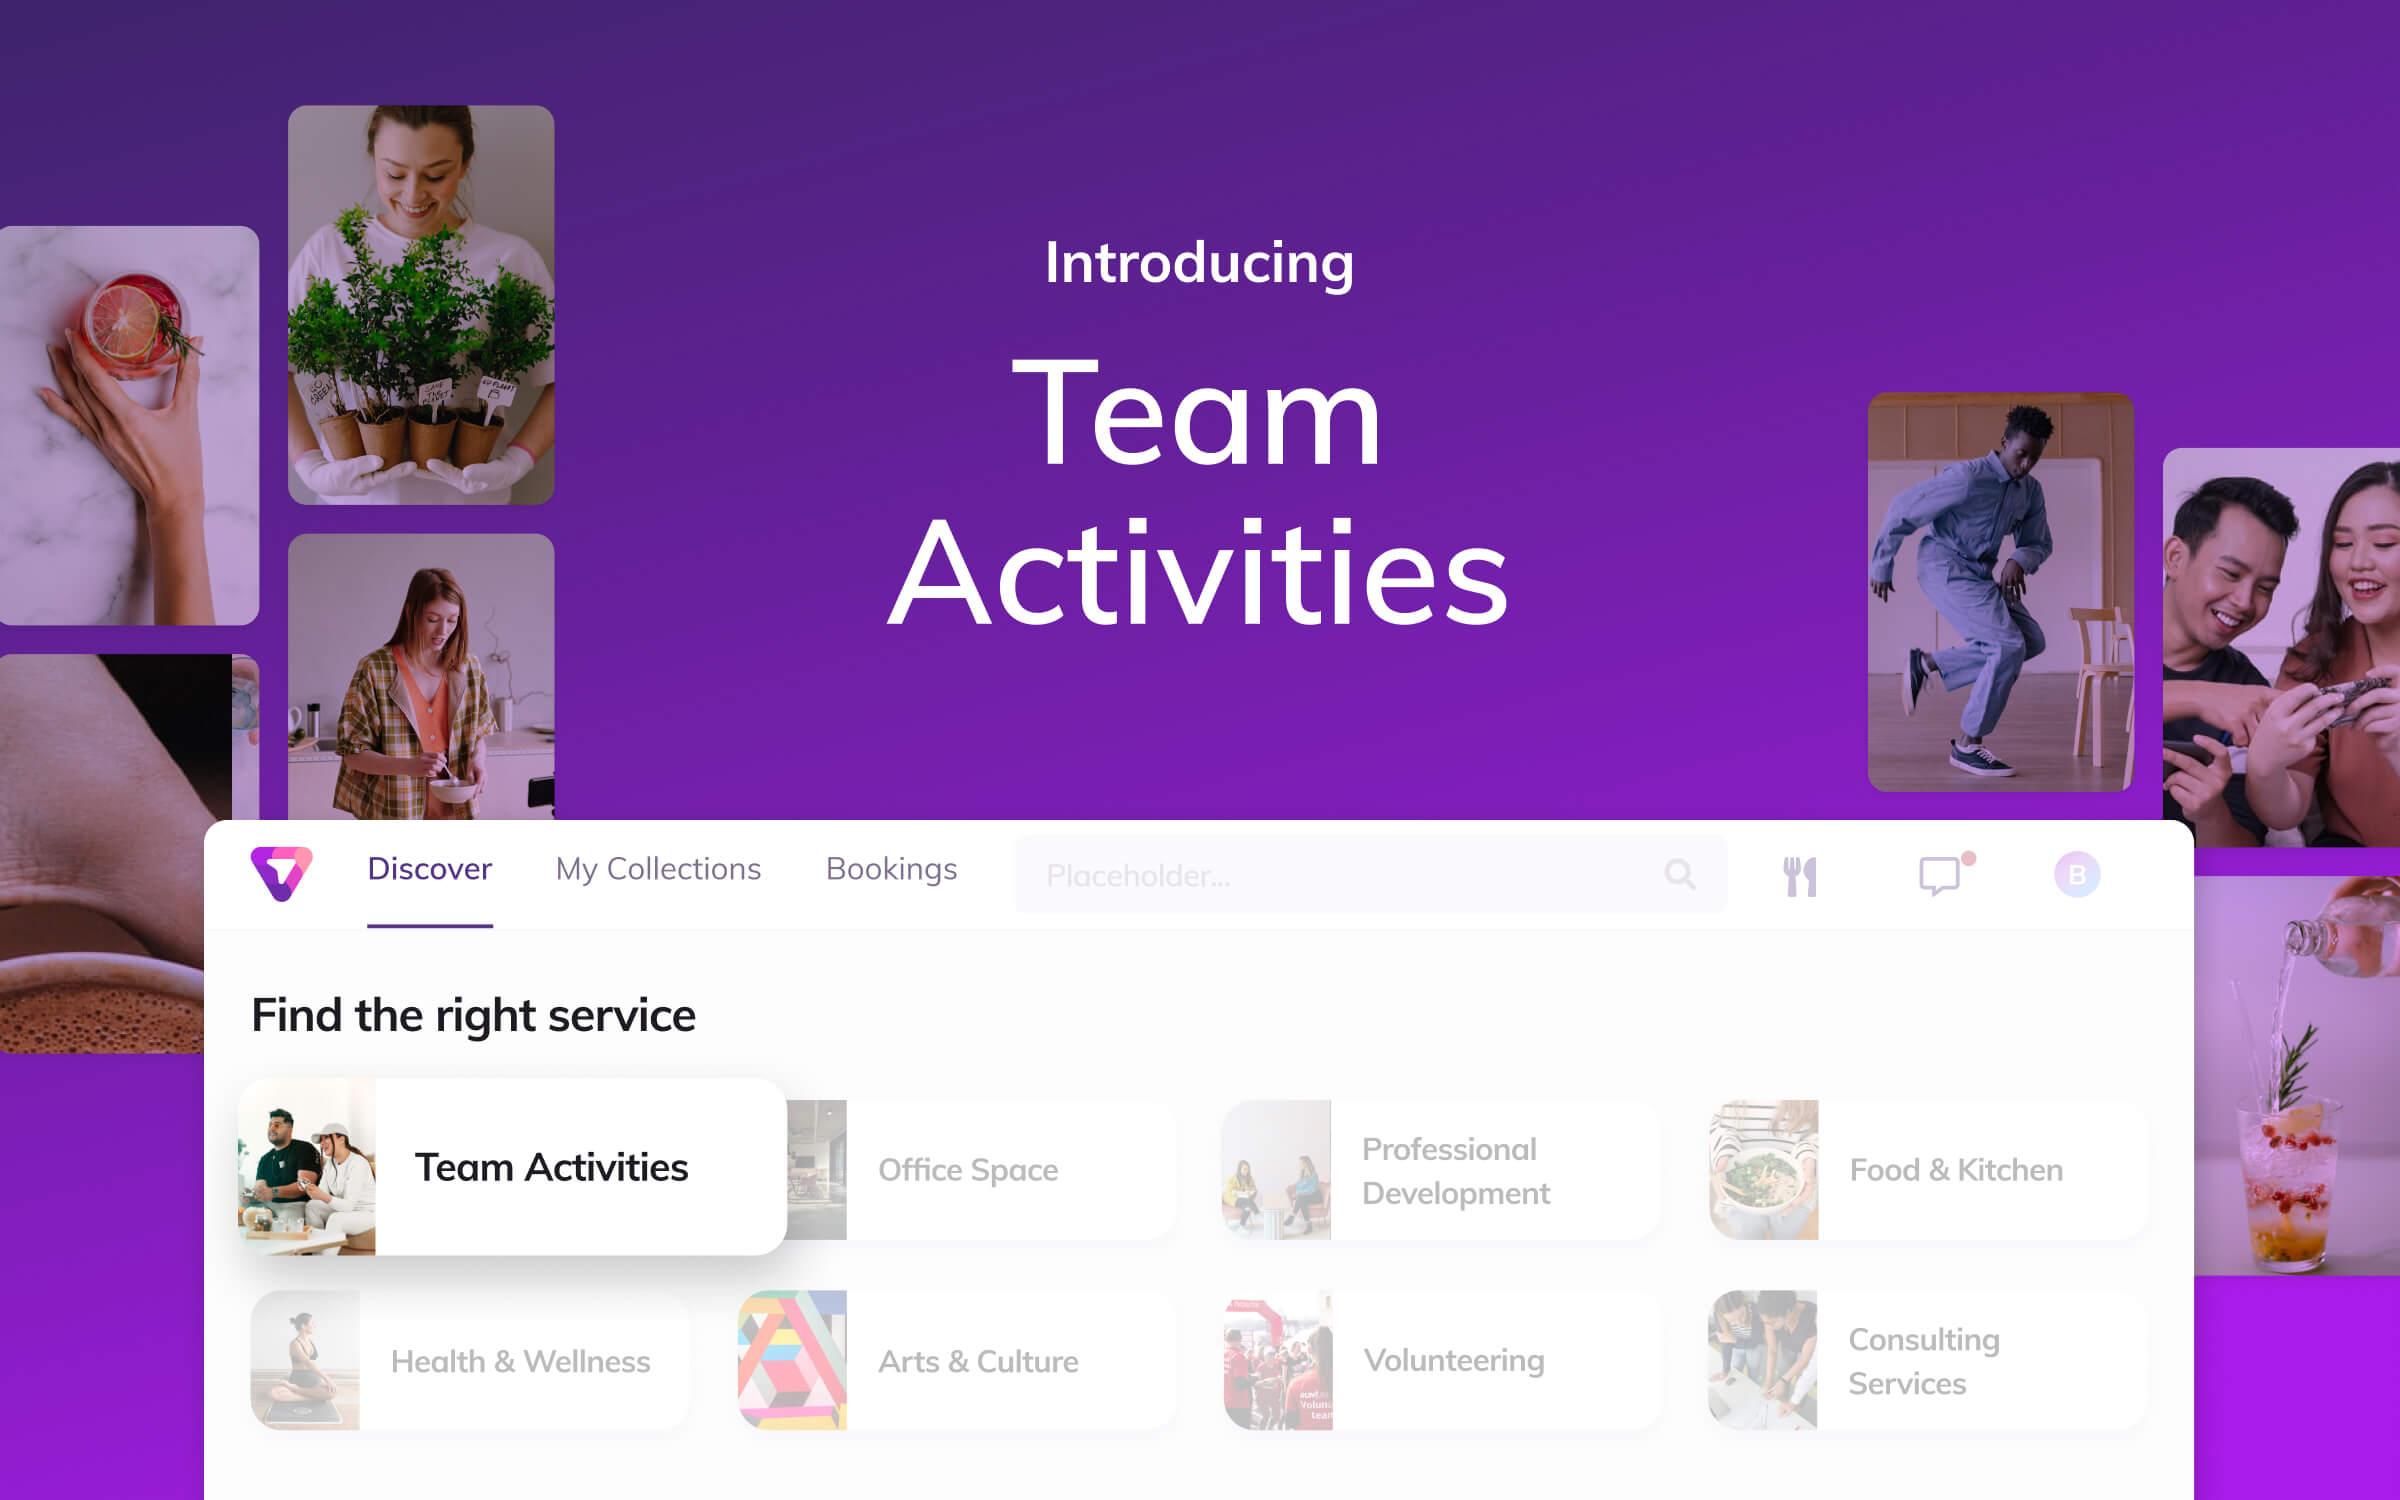 team activities image from platform